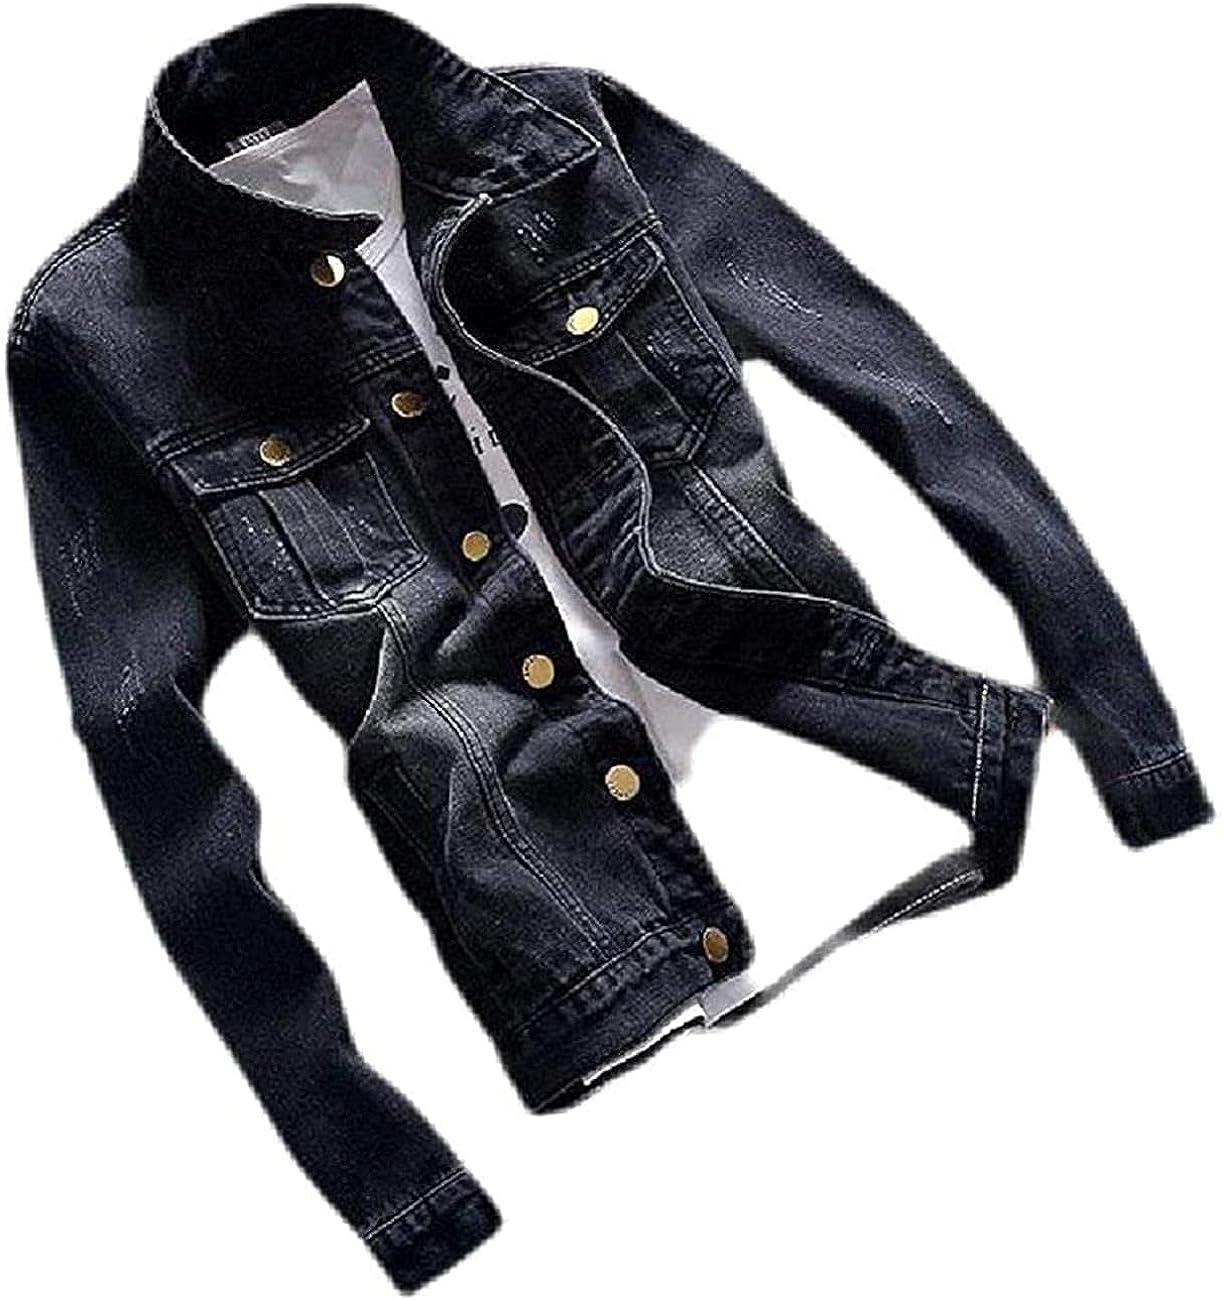 Men's Vintage Slim Fit Button Pockets Today's only Denim Price reduction Up Jacket Coat